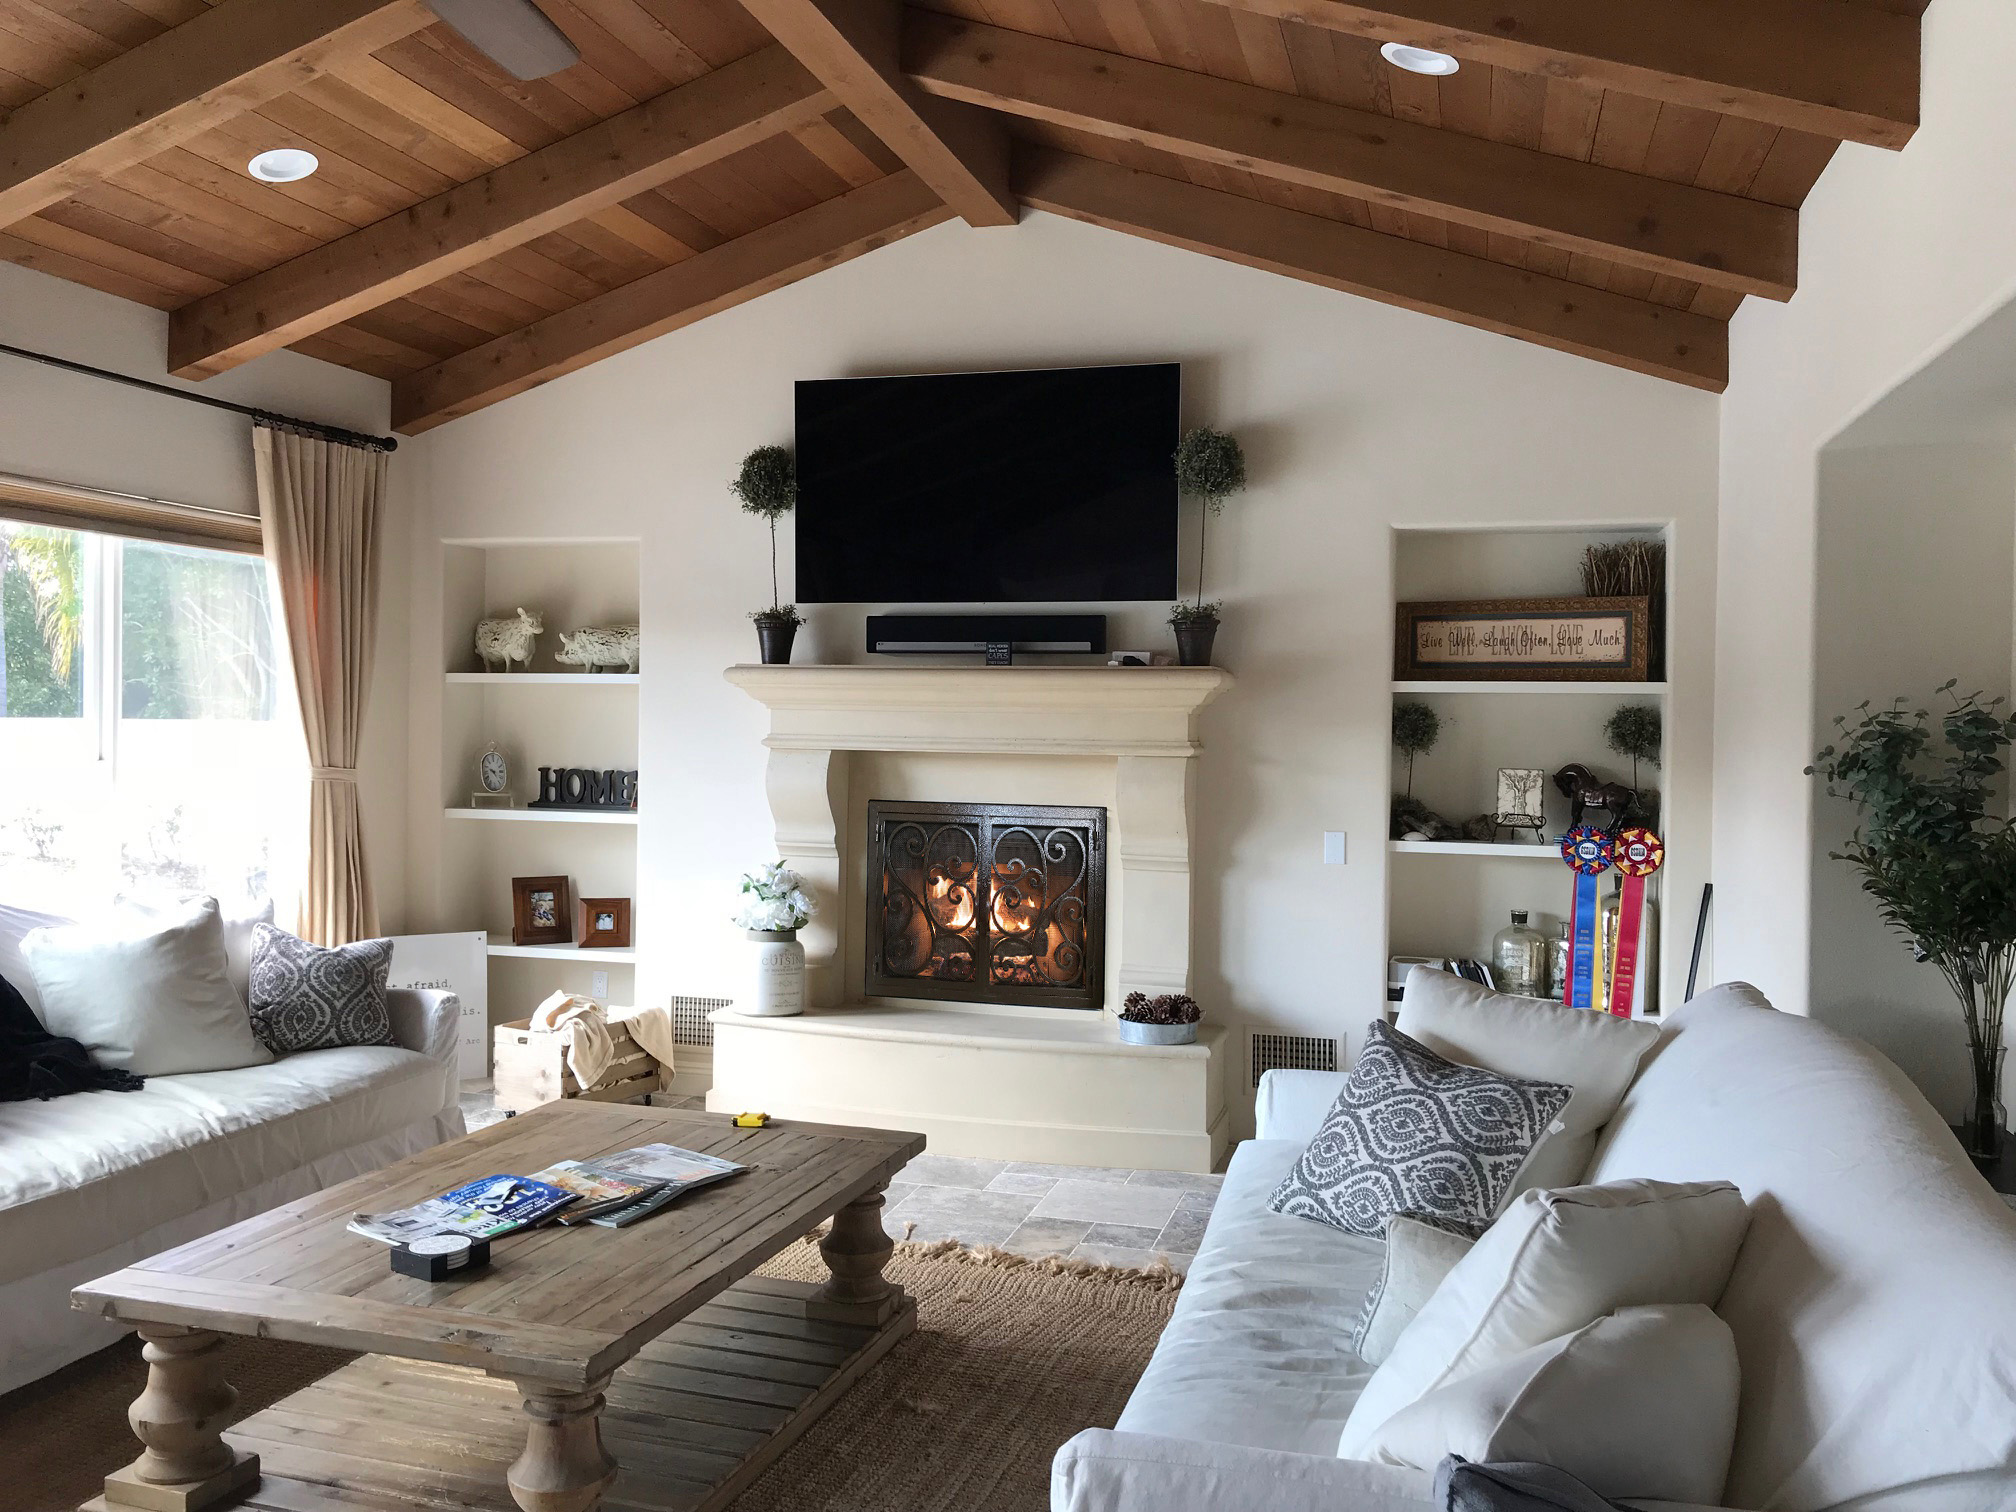 Fireplace Mantels Fireplace Surrounds Iron Fireplace Doors And